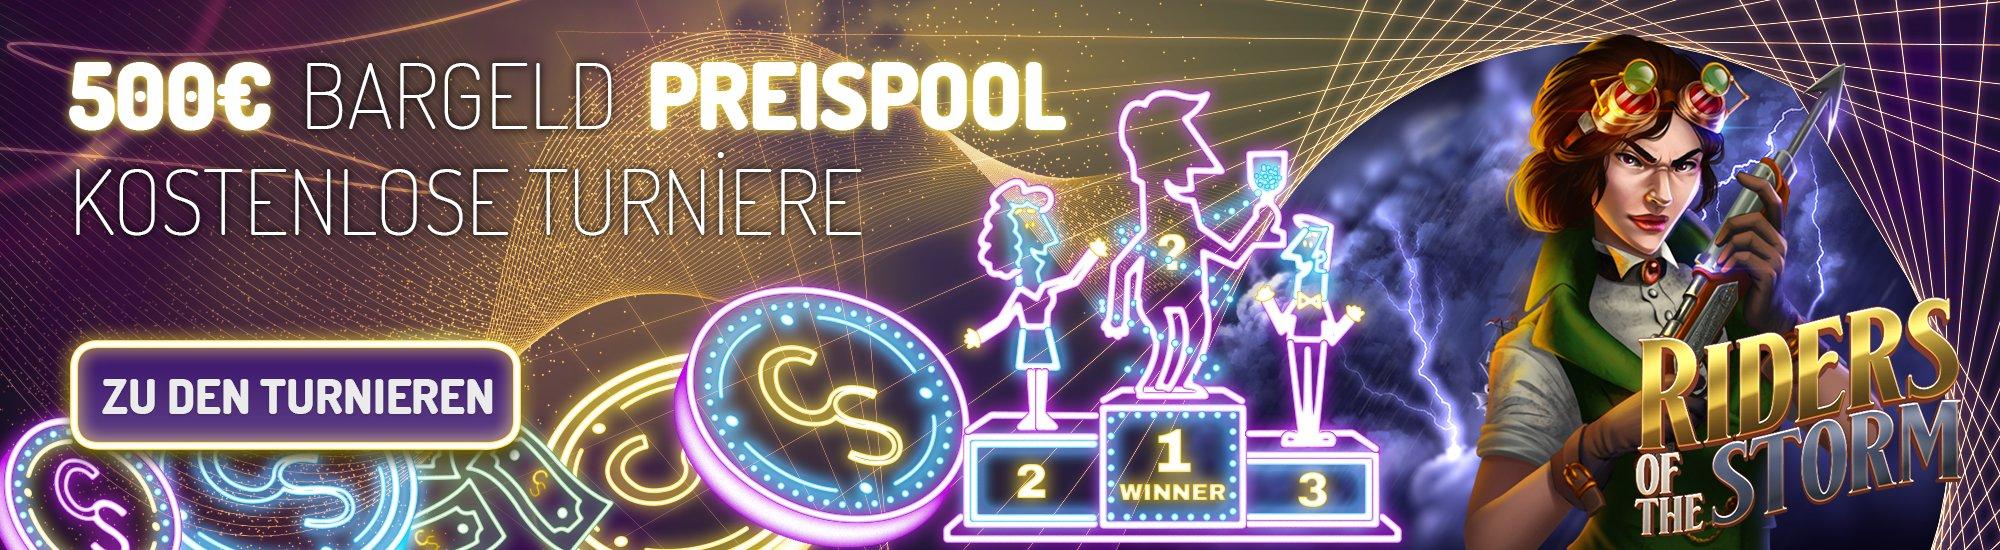 casinosecret_riders_of_the_storm_turnier